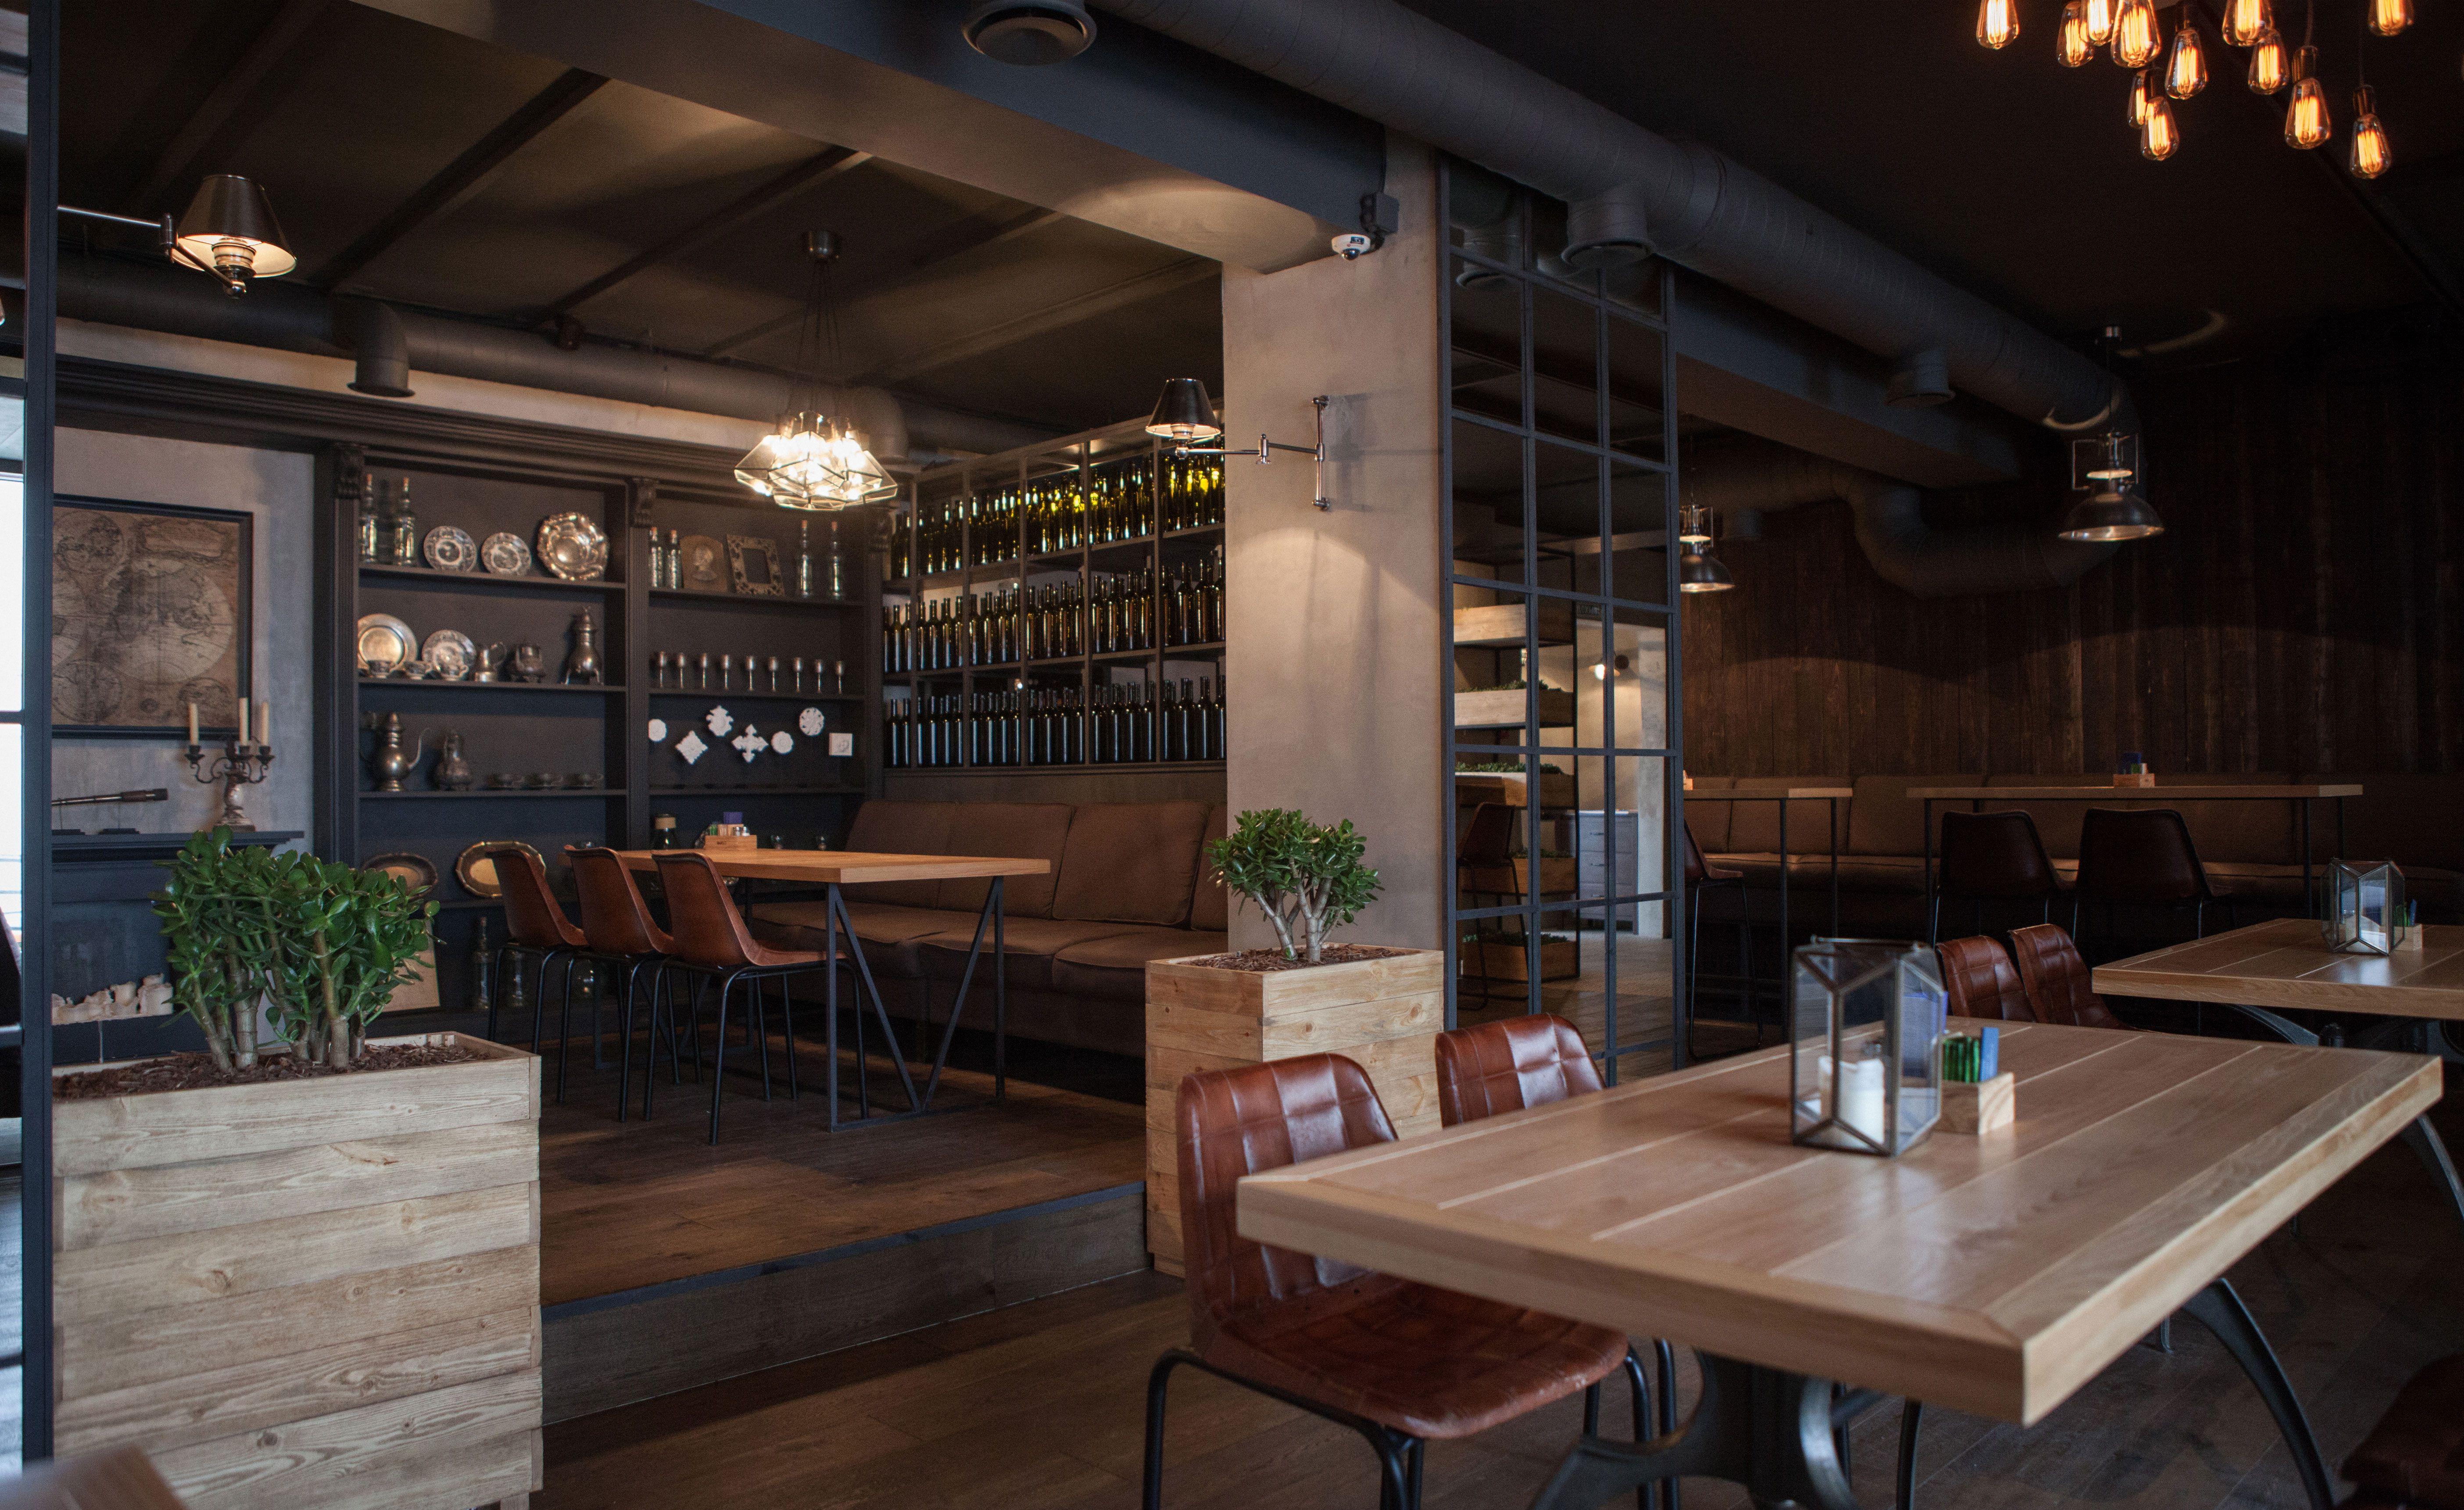 Barco Bar Grill Novorossiysk Russia Grill Design Restaurant Bar Grill